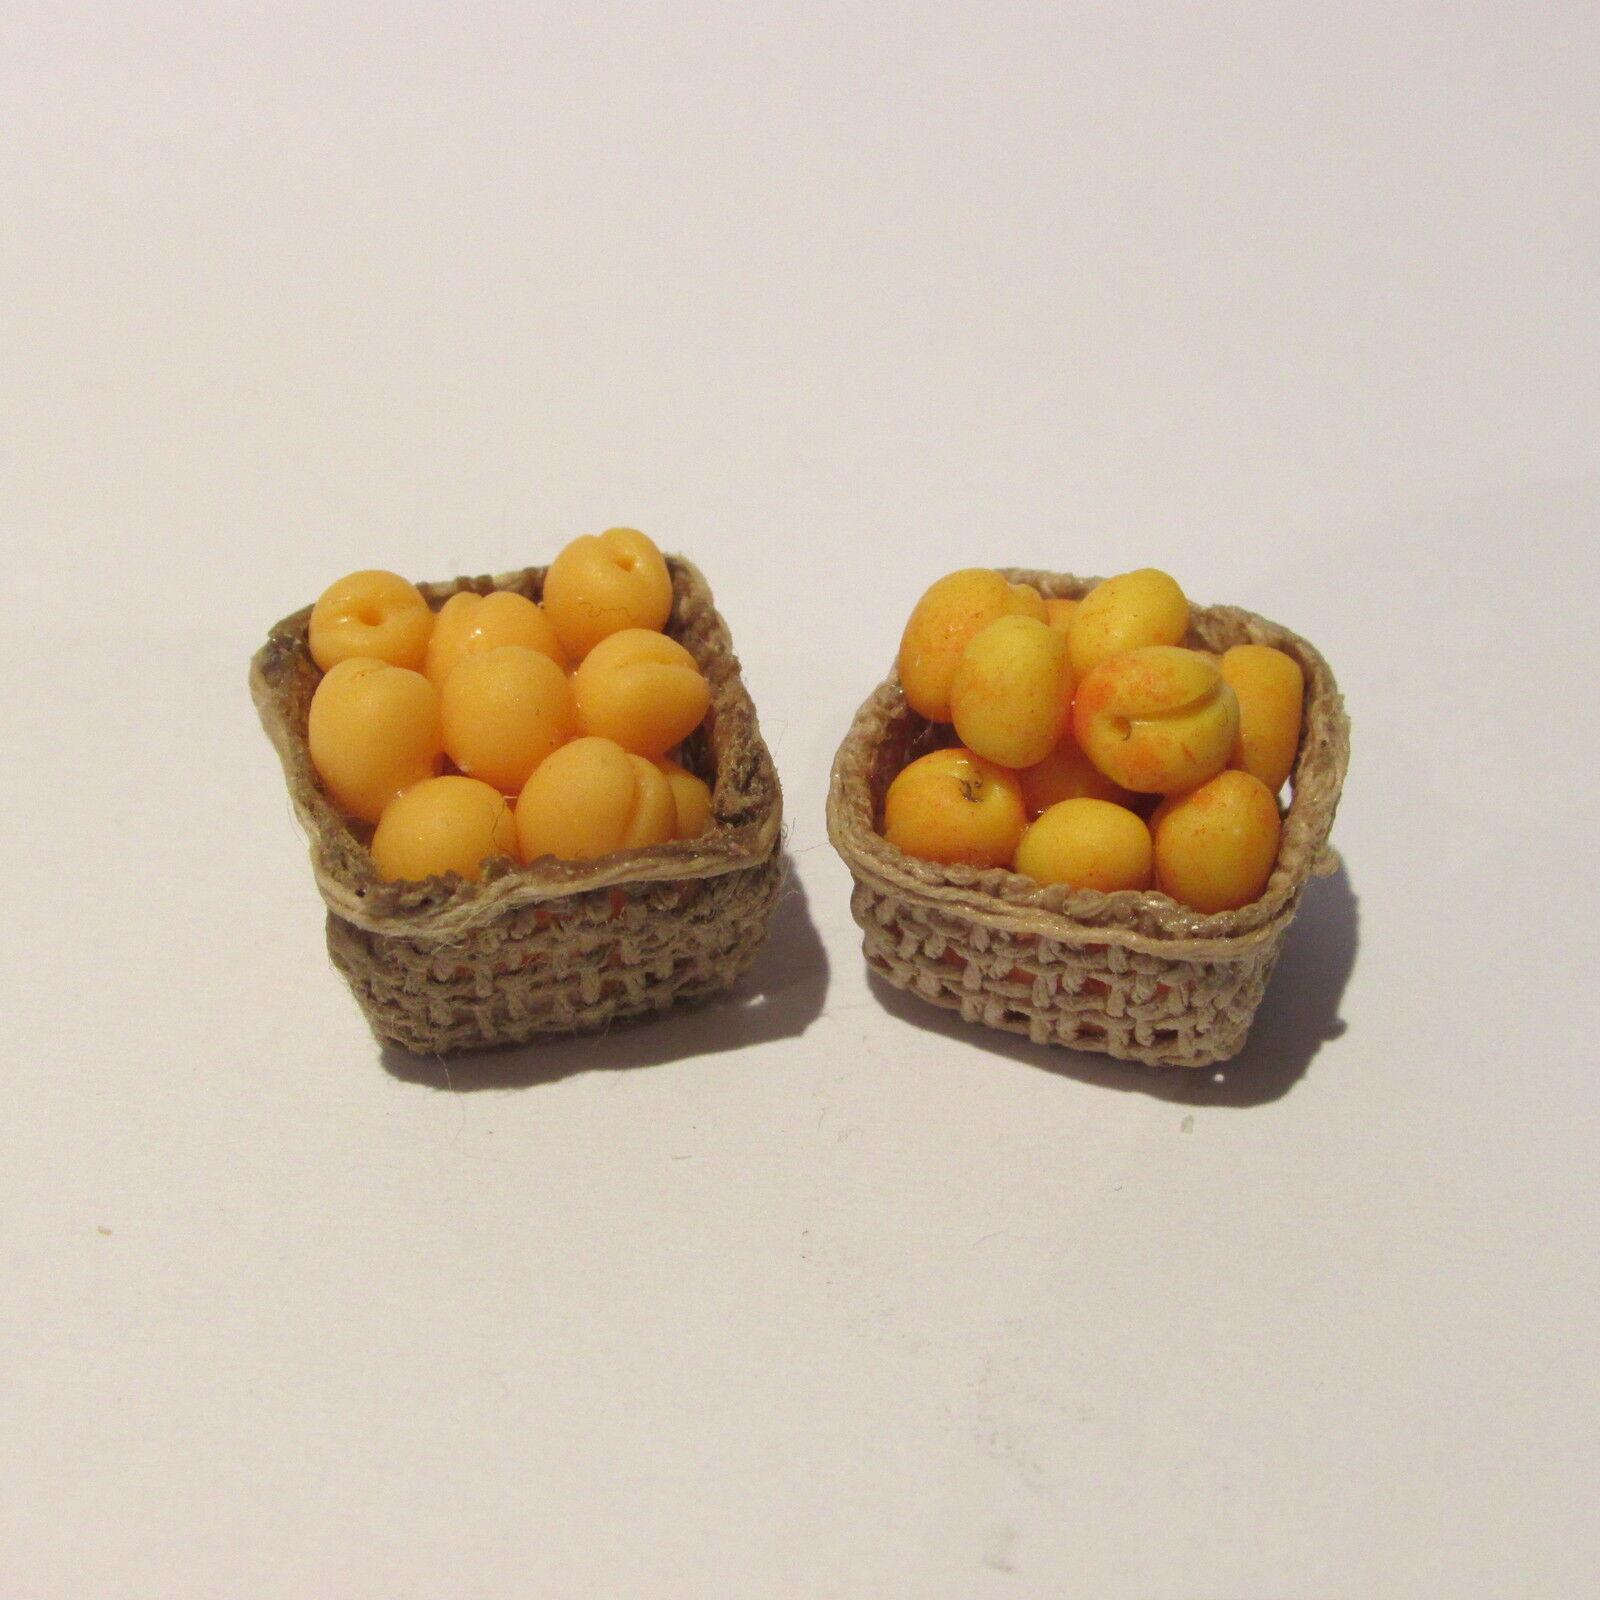 Albicocche nella casella casella casella  COPPIA  DOLL HOUSE miniatura cibo  1 12 scale ad32d8